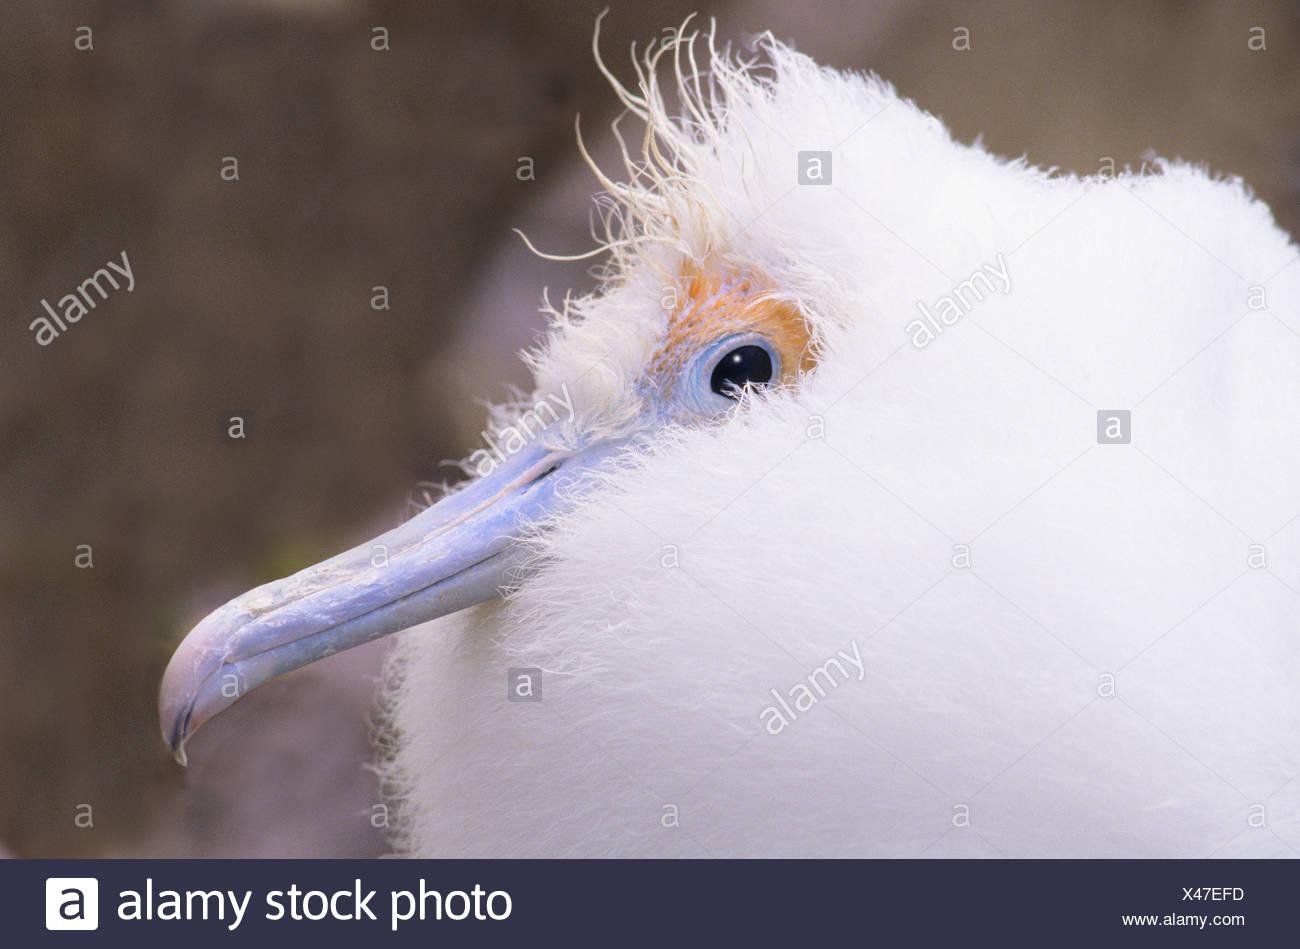 Great frigatebird chick (Fregata minor), Tower island (aka Genovesa Island), Galapagos Archipelago, Ecuador - Stock Image